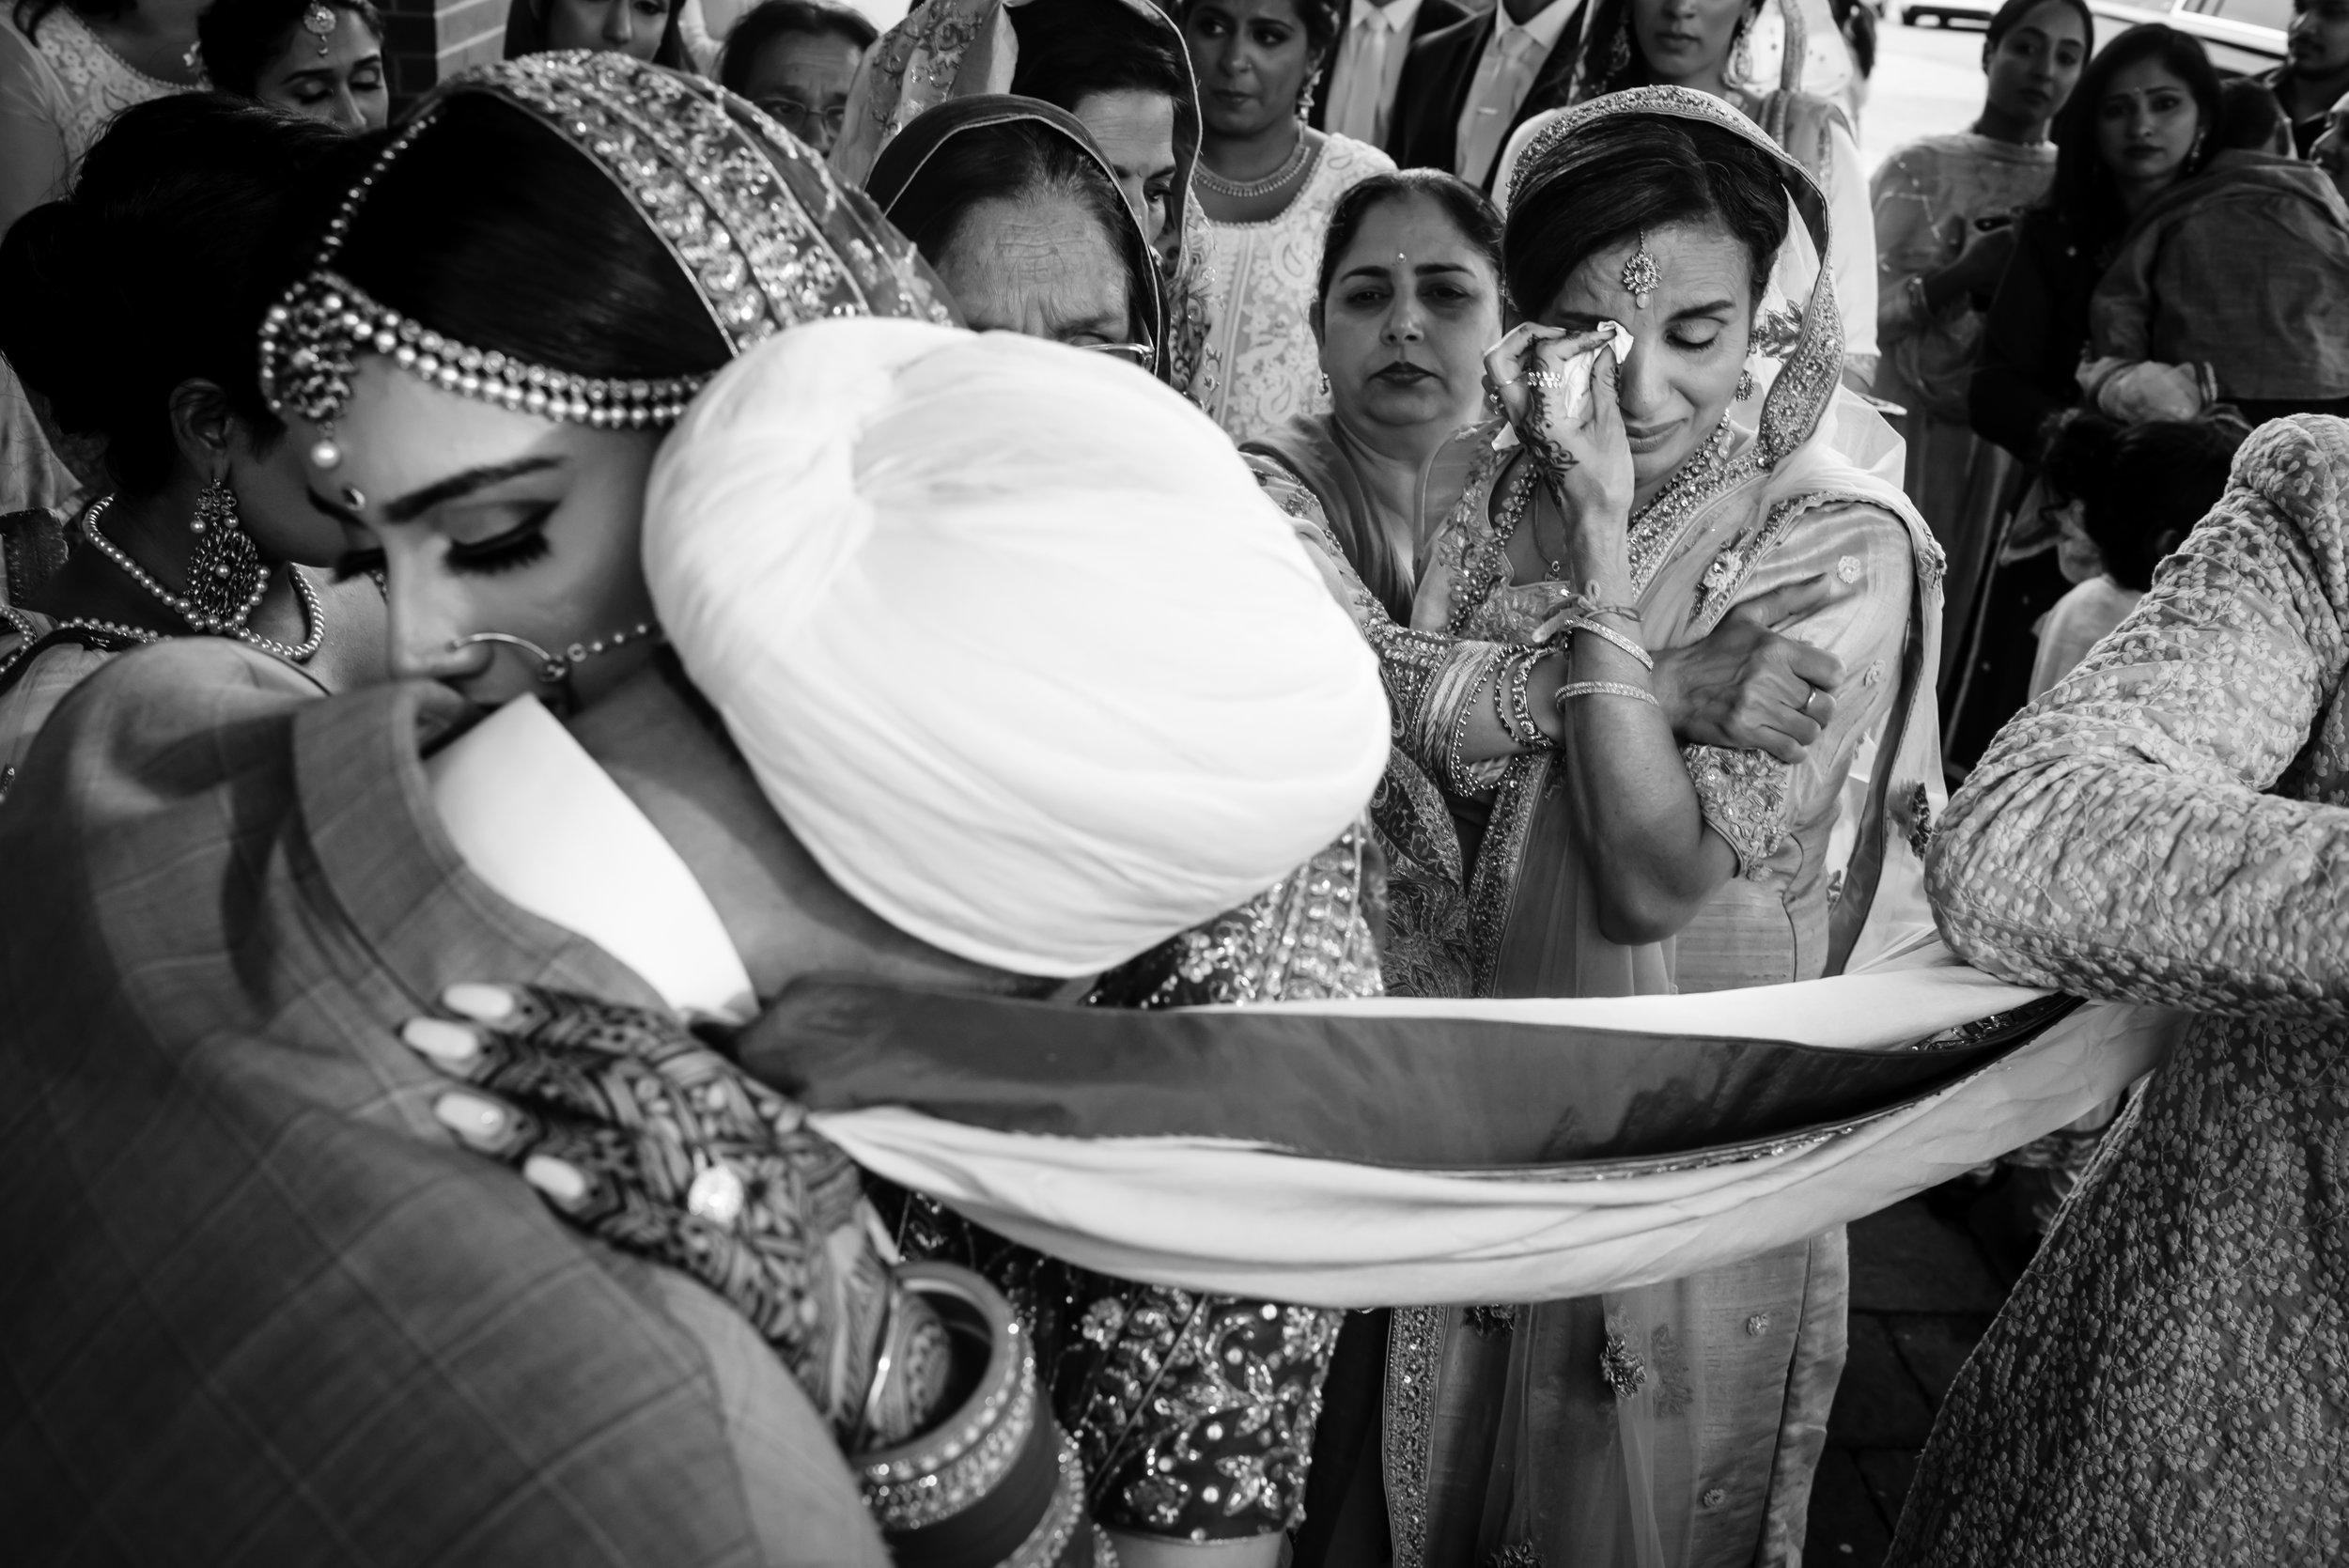 2018-06-23-Wedding-Jide Alakija-Toronto-Anmol and Simran-01821.jpg